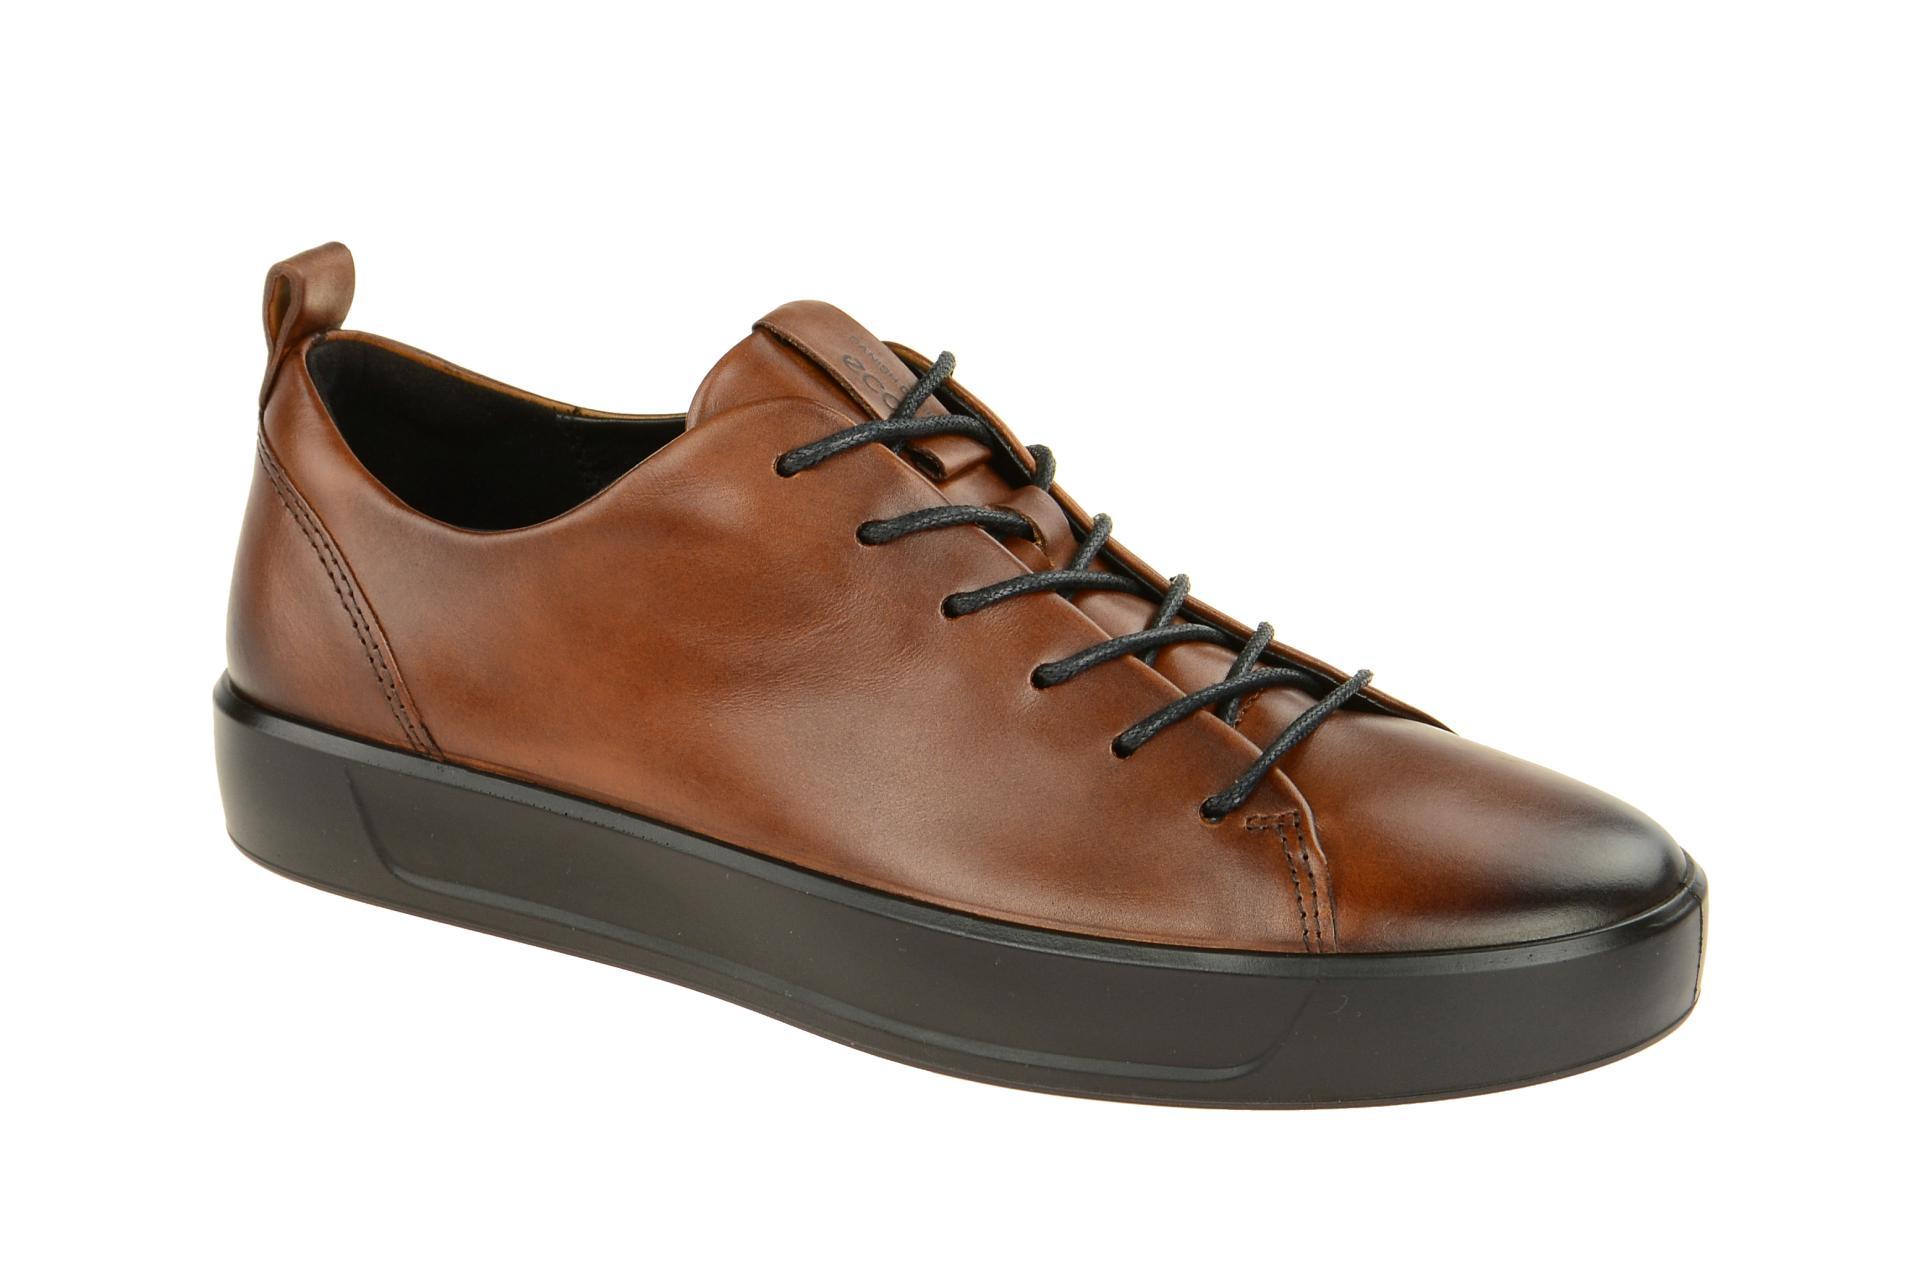 5ed2035bb57e1b Ecco Soft 8 Schuhe braun Herren Sneaker - Schuhhaus Strauch Shop